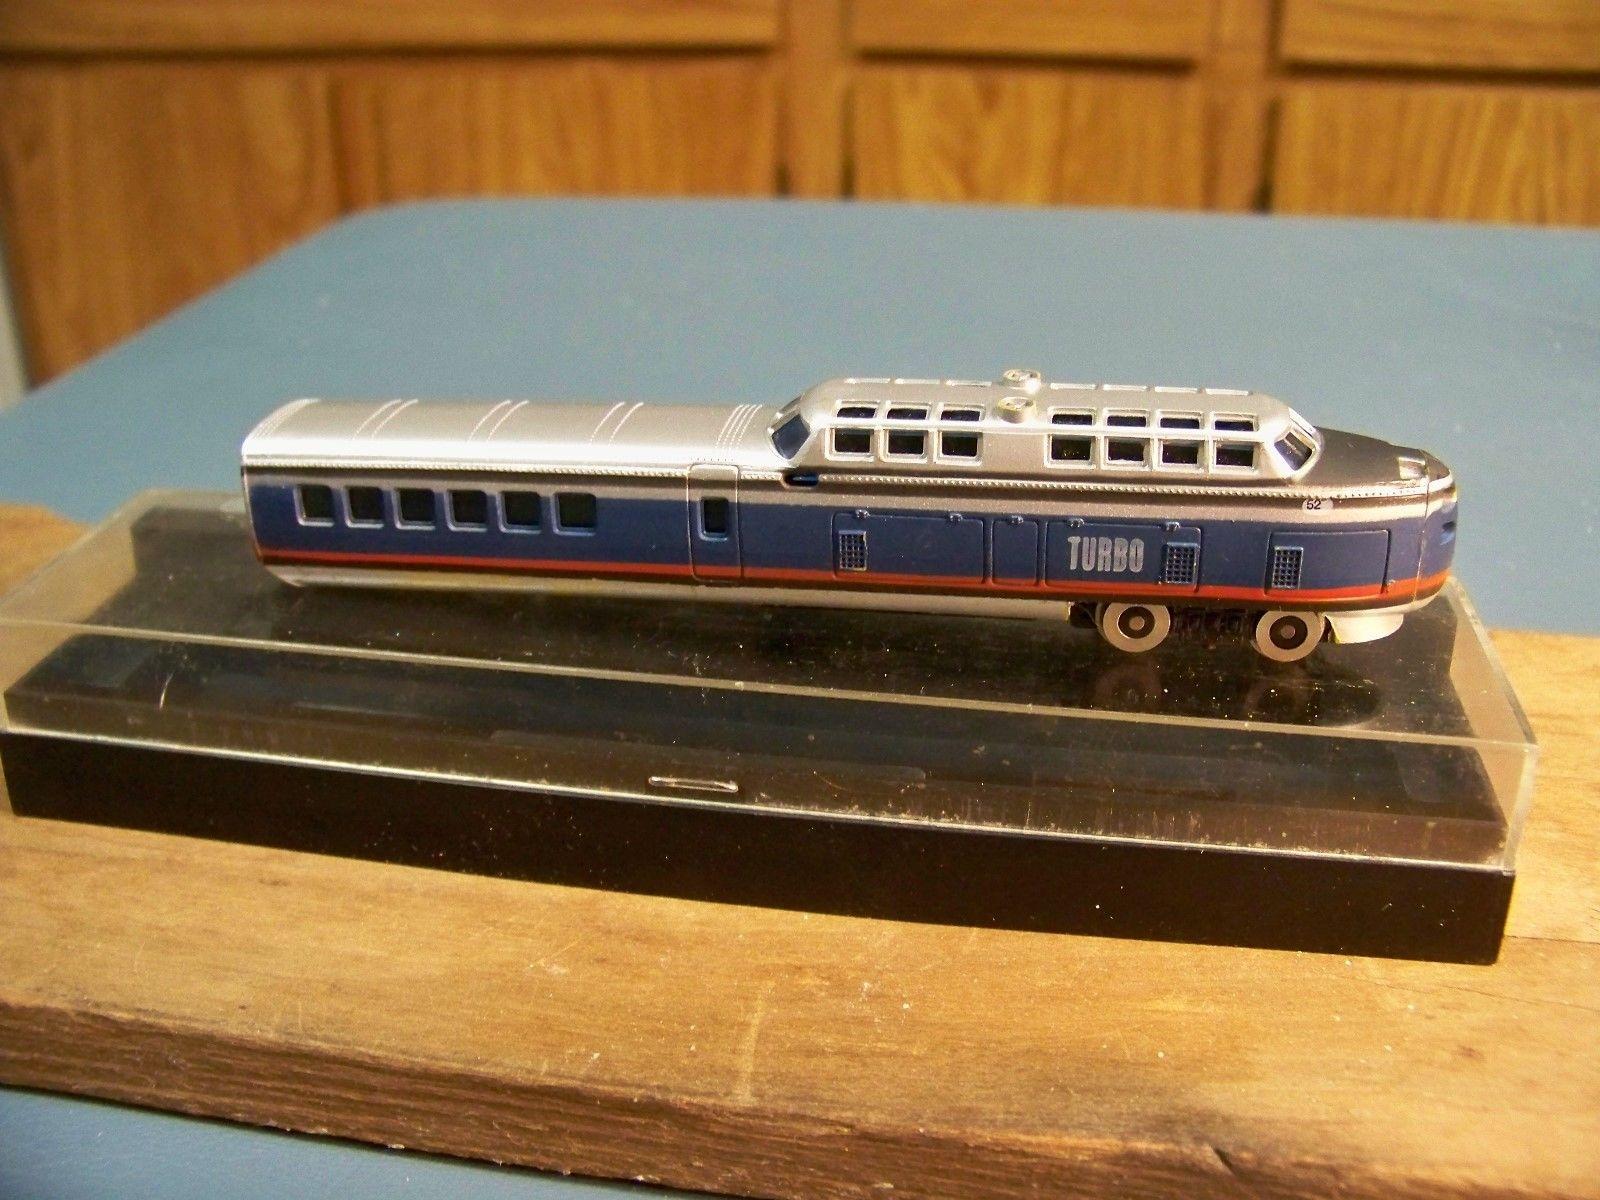 N Scale - Bachmann - 4740 - TurboTrain - Penn Central